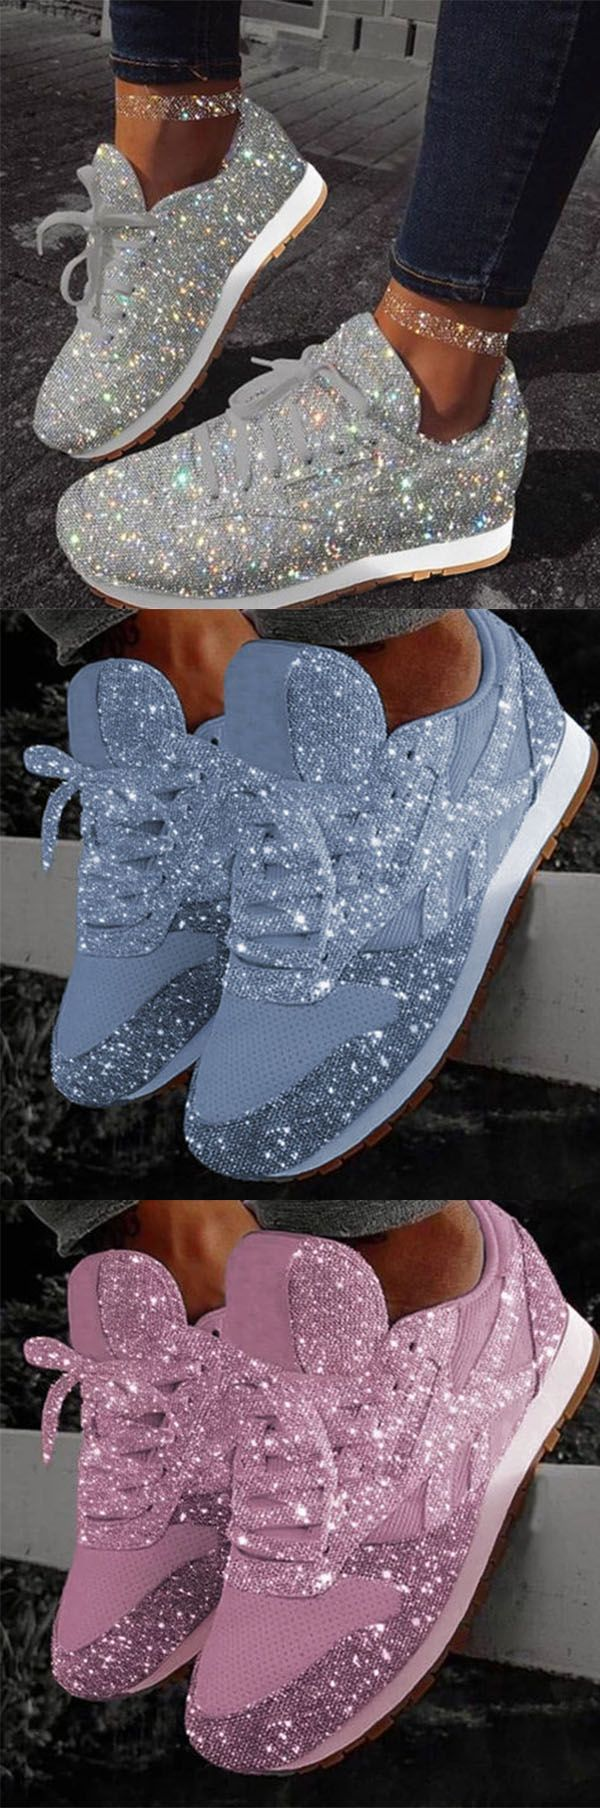 Hot sale! Women Muffin Rhinestone New Crystal Platform Sneakers   – Bling Bling